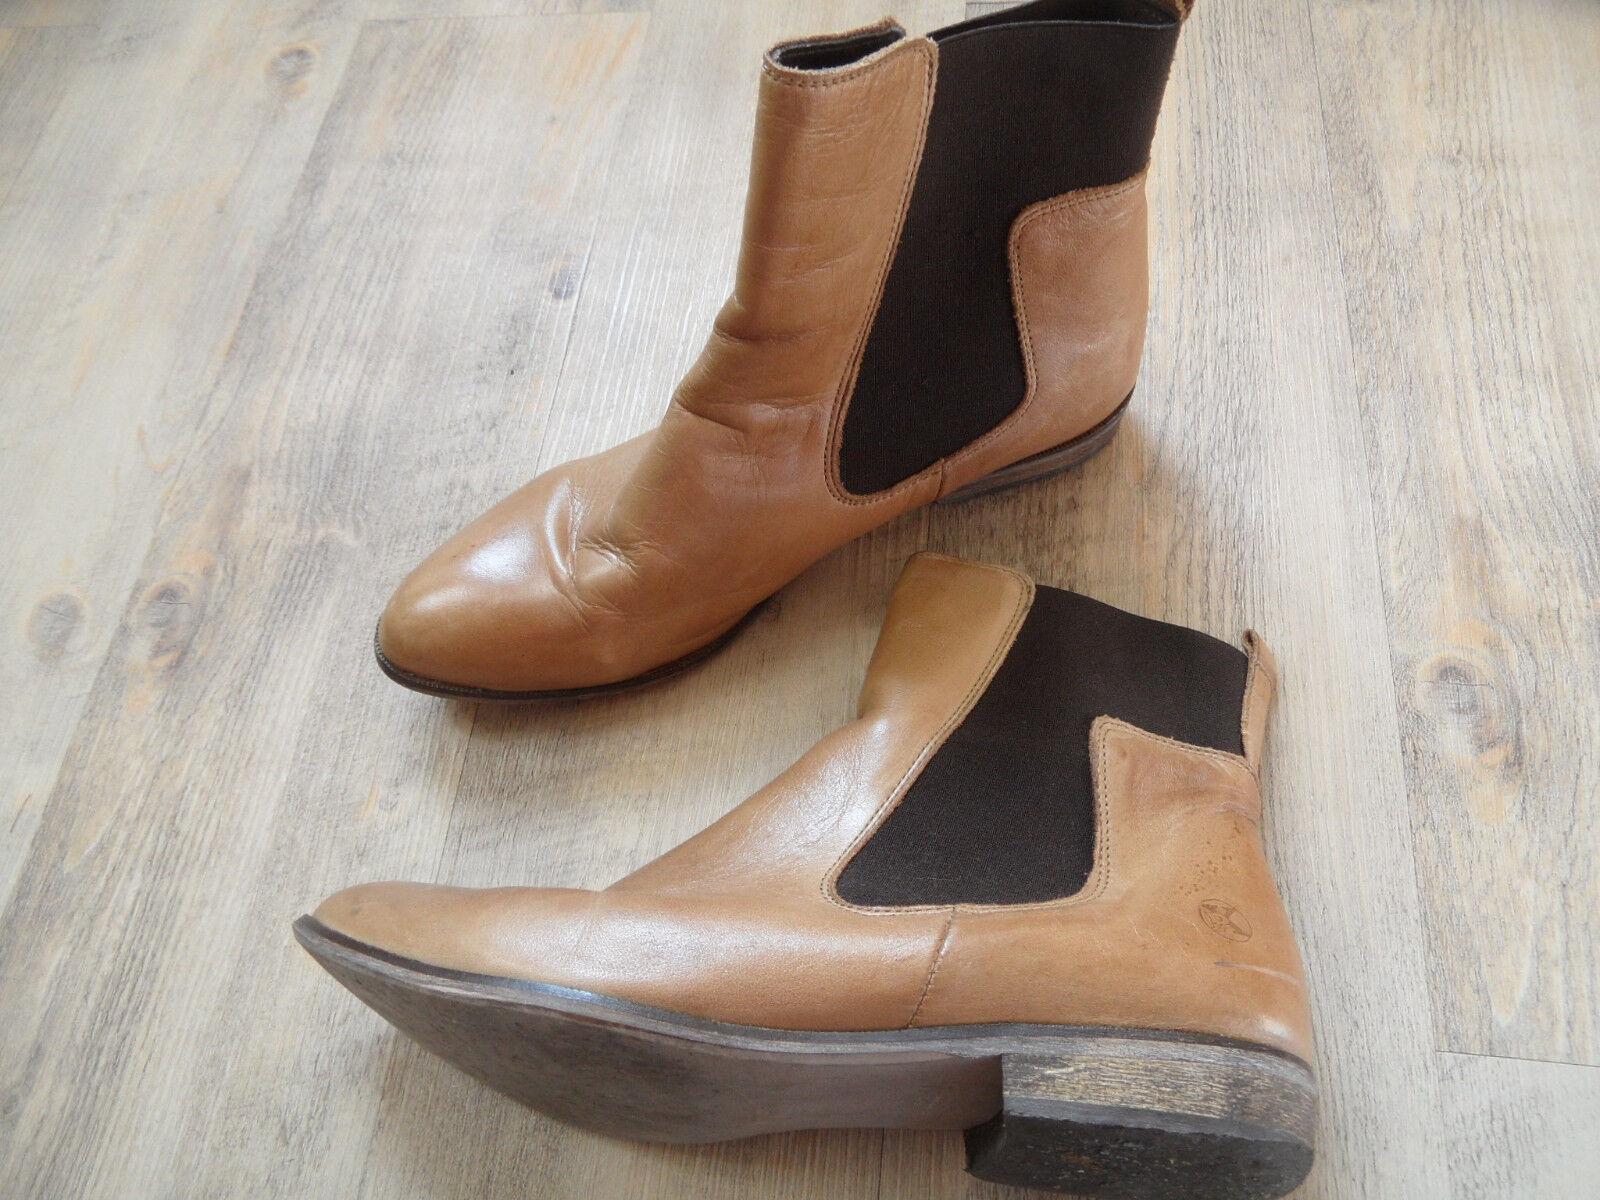 Post Exchange geniales chelsea botas beige talla 42 top kos318